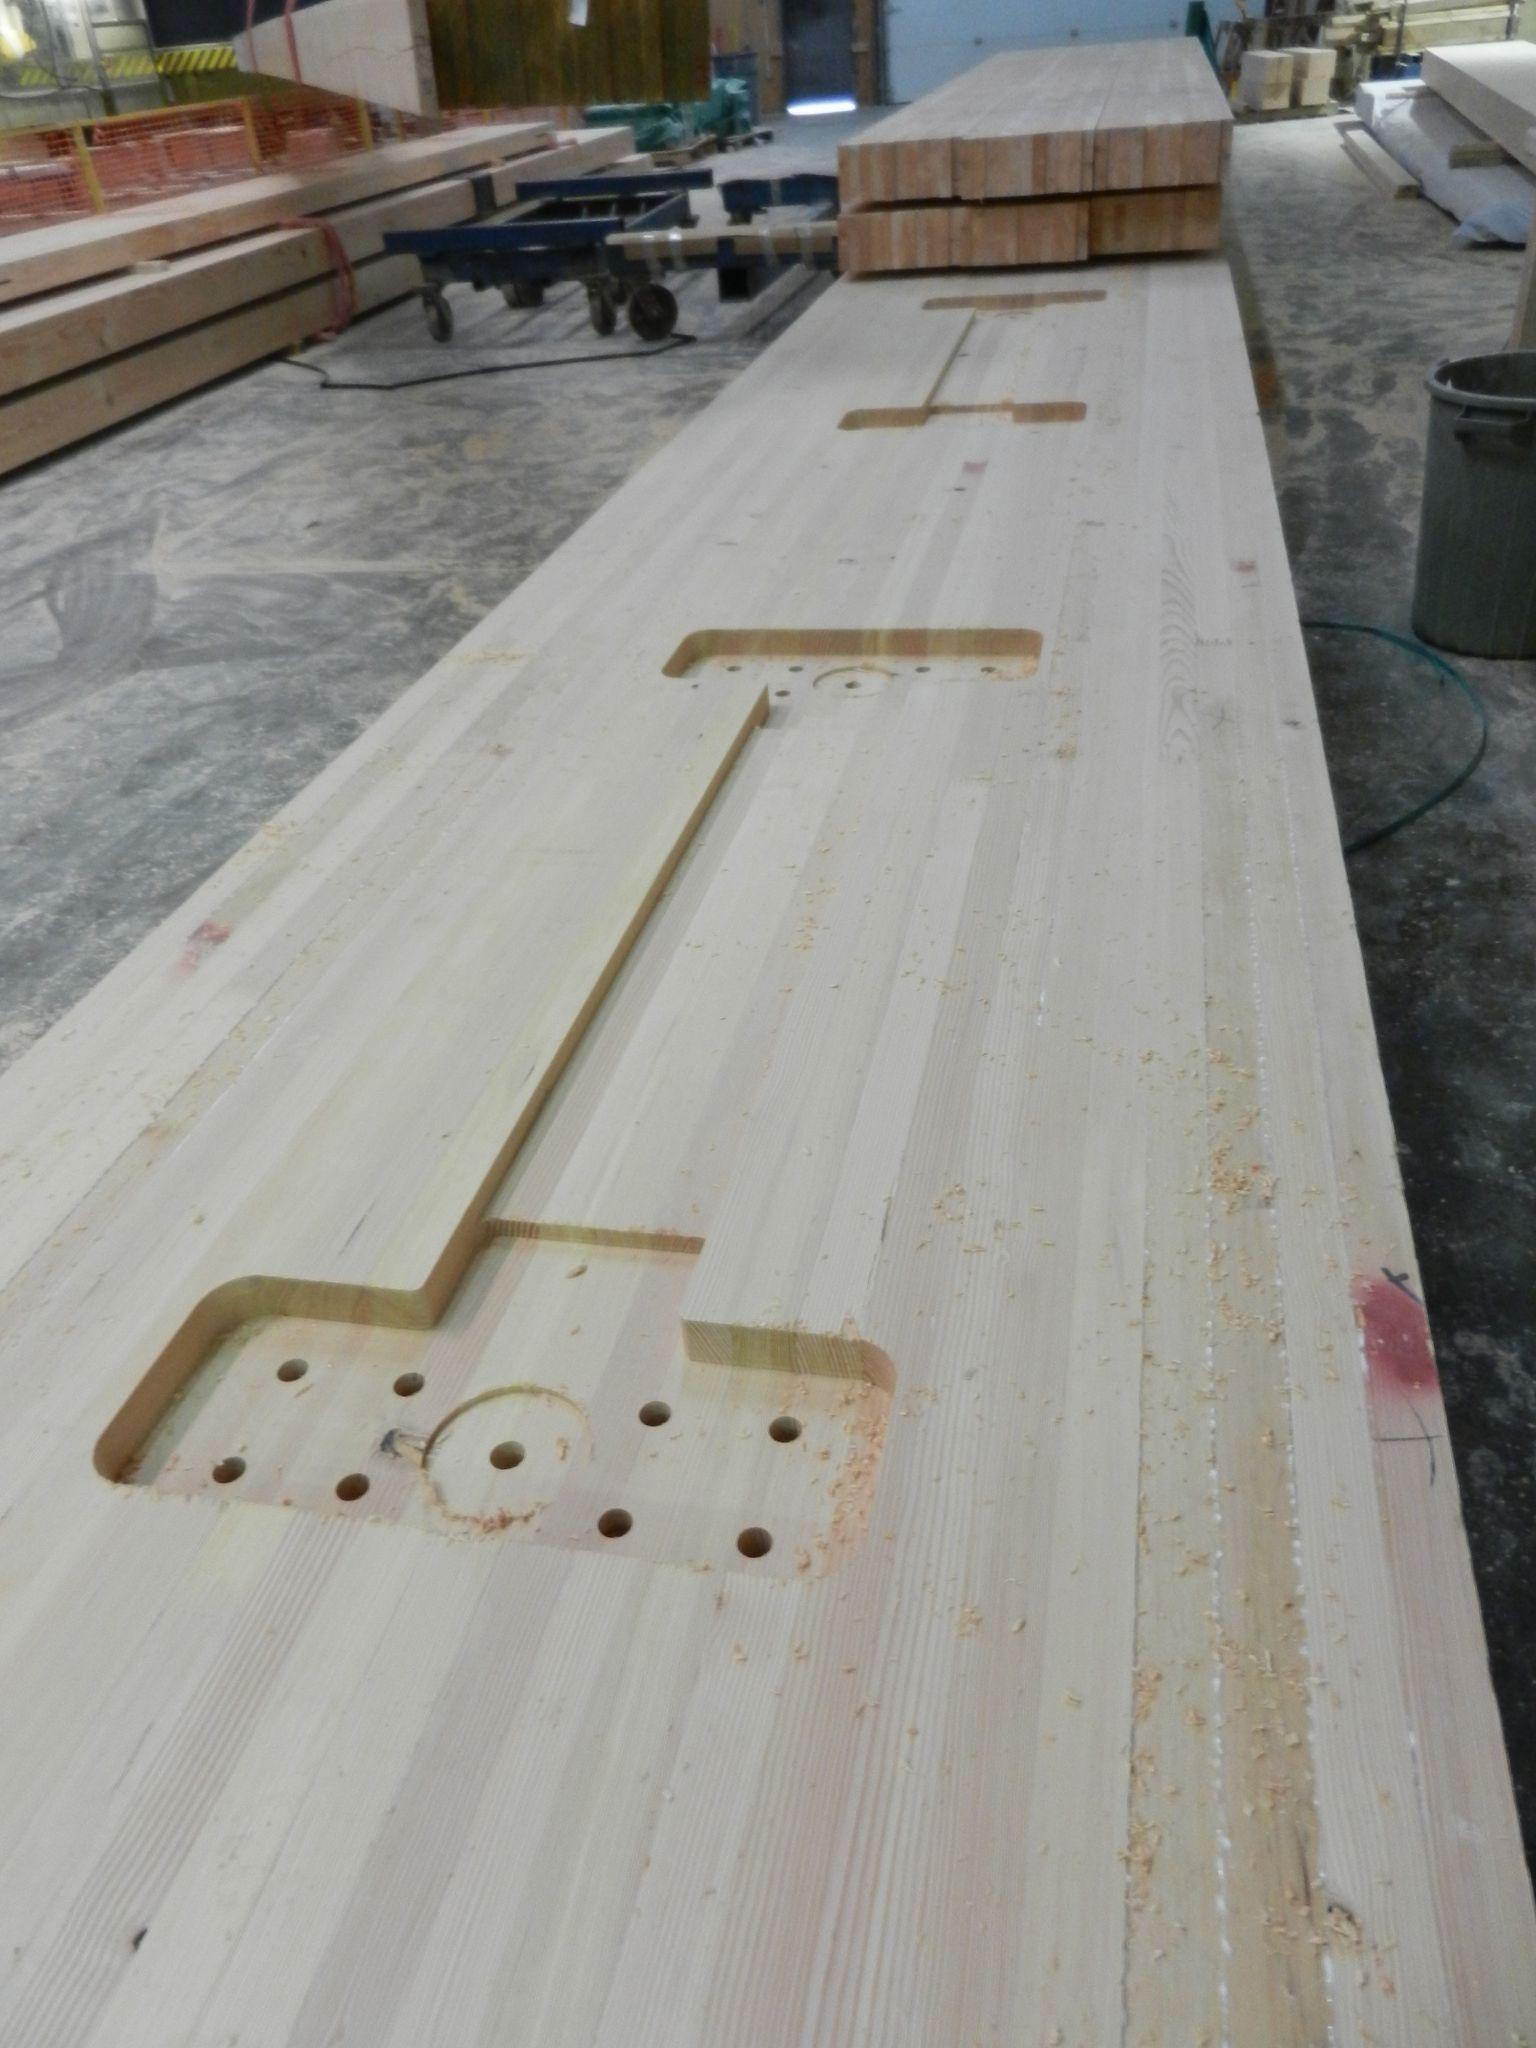 Glued Laminated Beams ~ Design of fire resistive exposed wood members